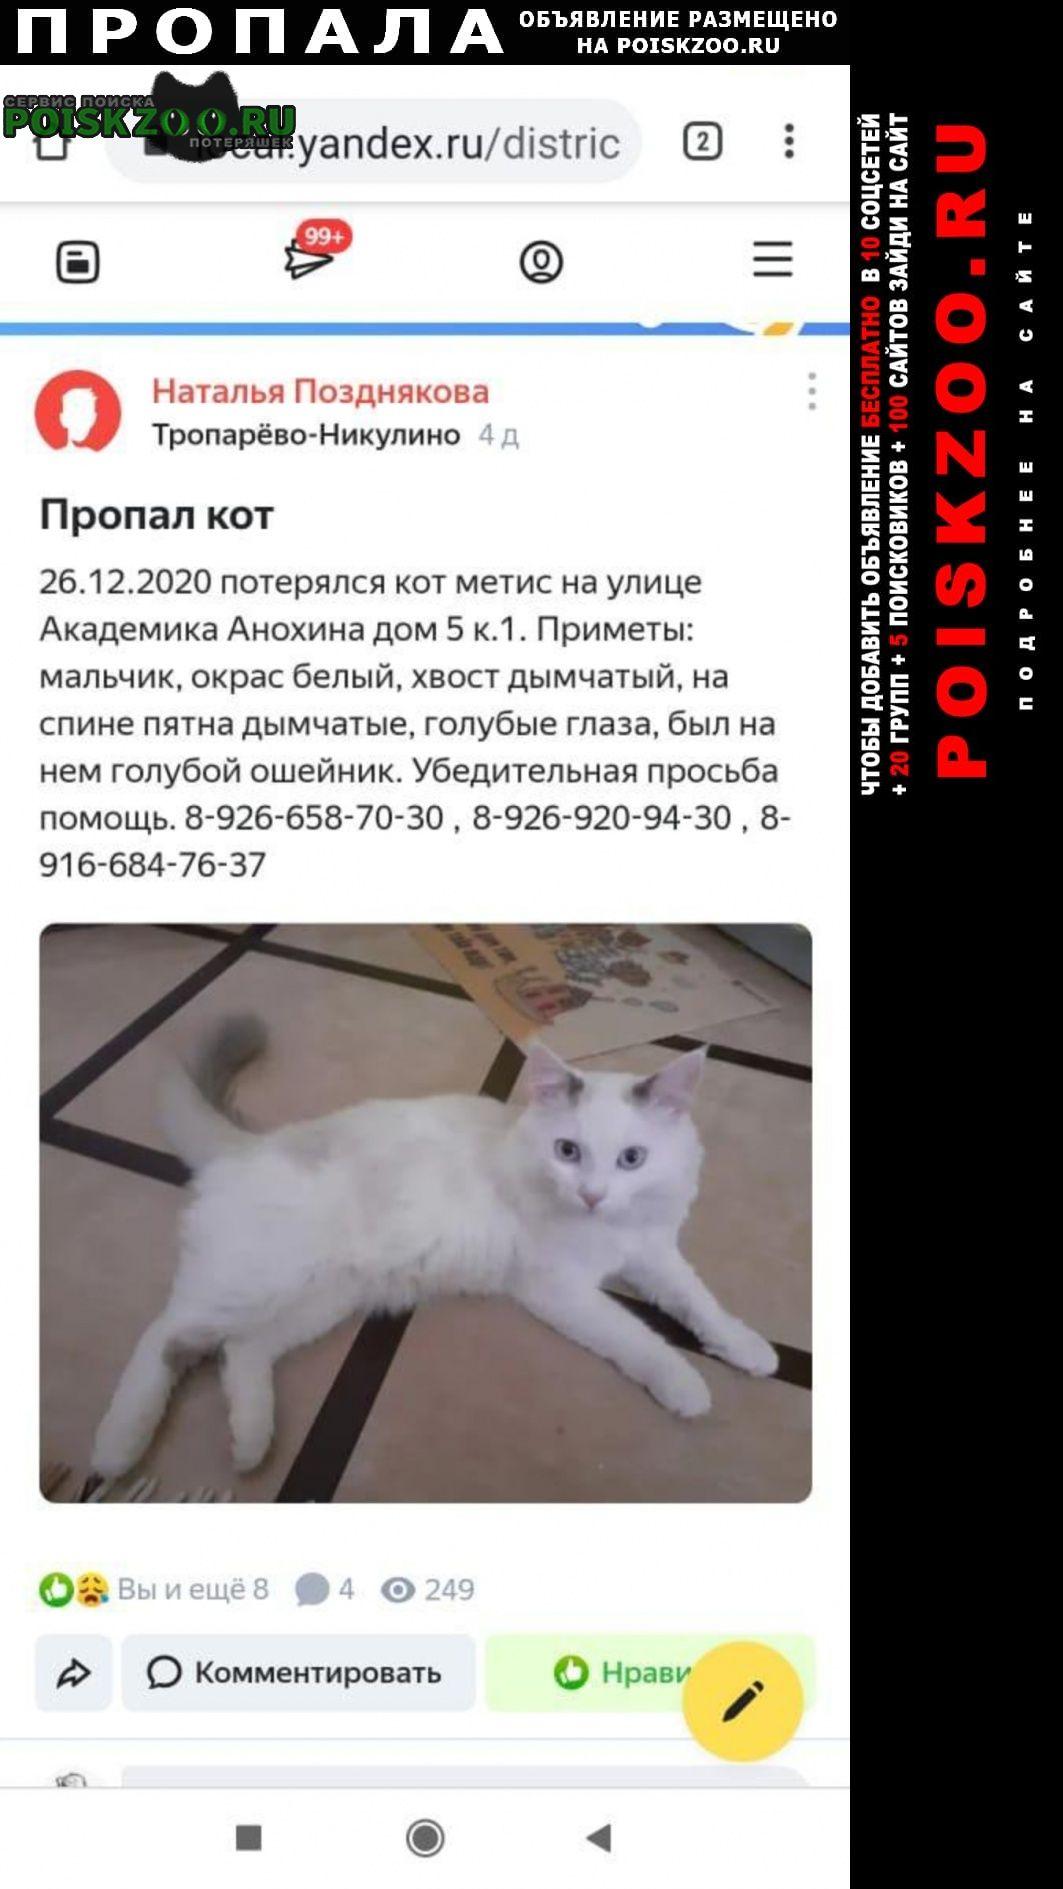 Пропала кошка кот..г.ул.акад.анохина Москва